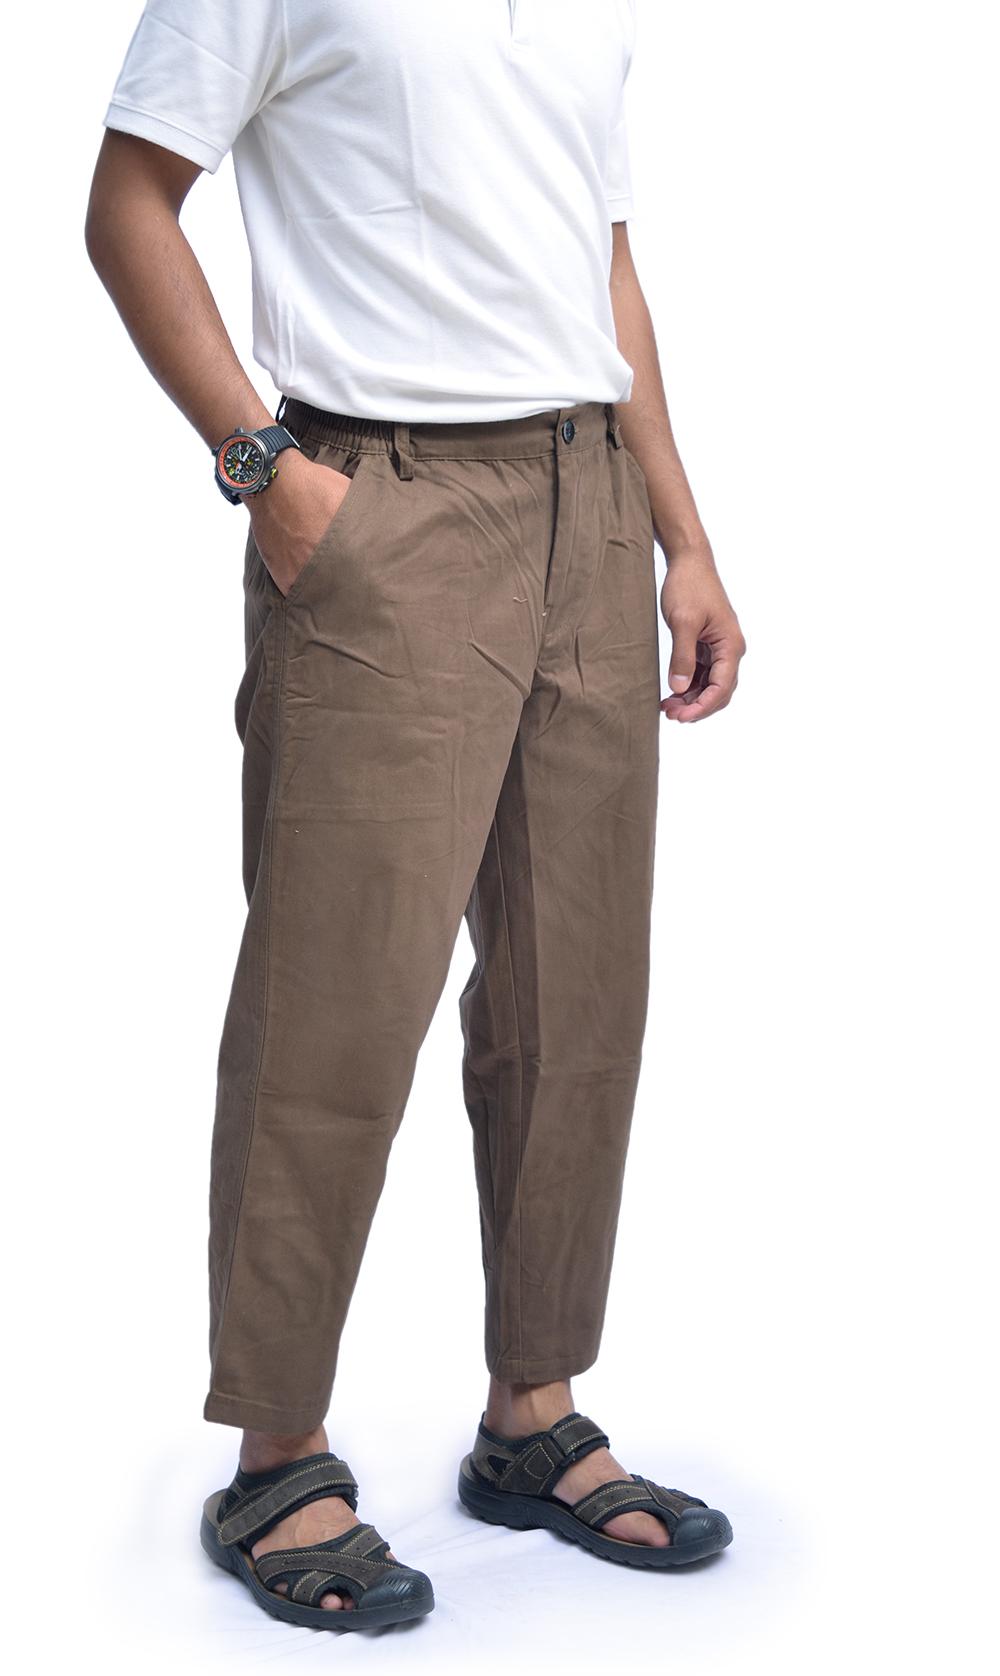 CS-002 Celana Sirwal Coklat